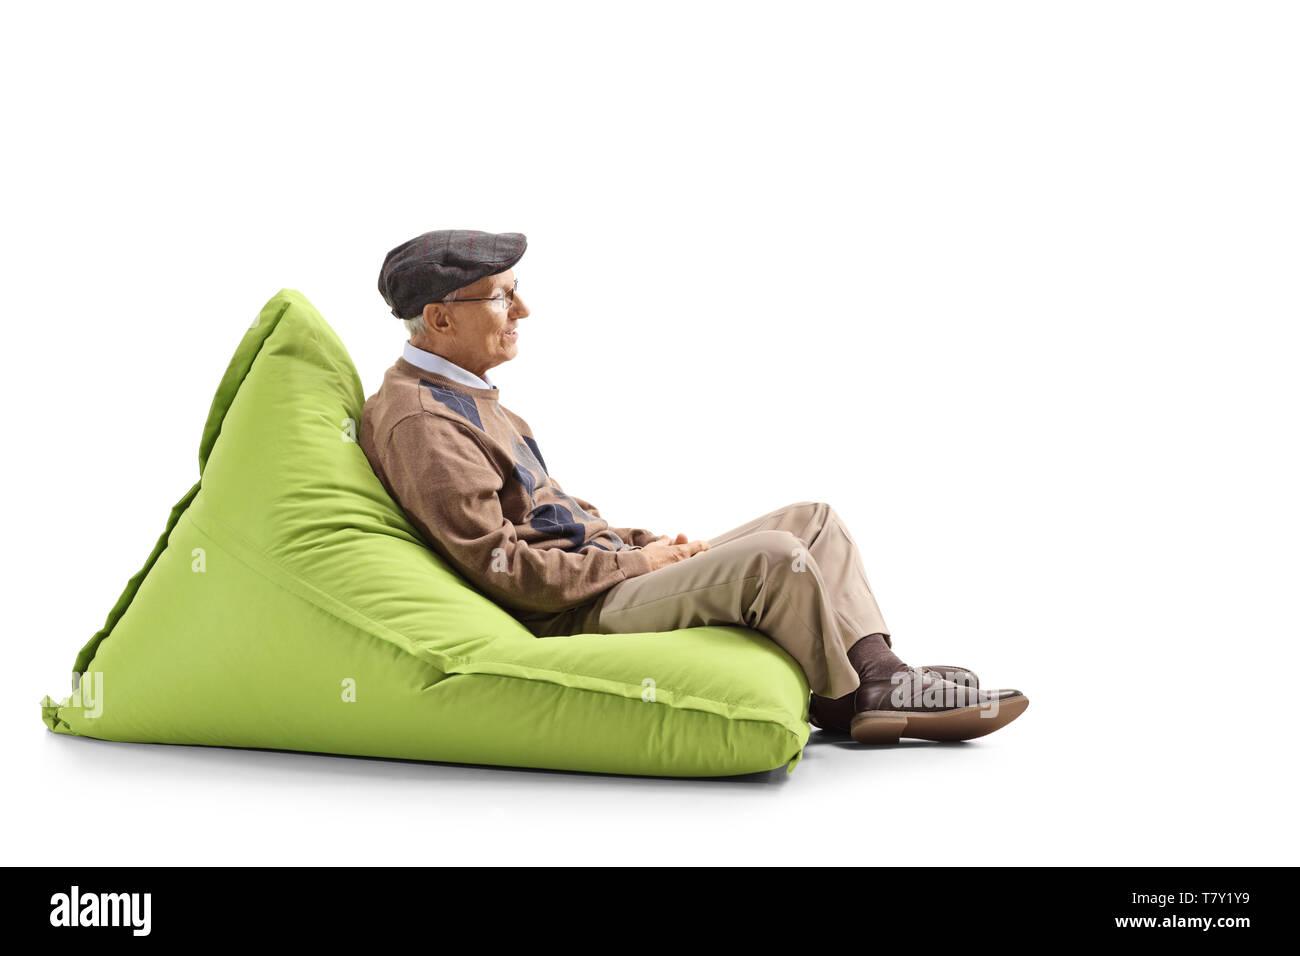 Full length profile shot of an elderly man resting on a bean bag isolated on white background - Stock Image